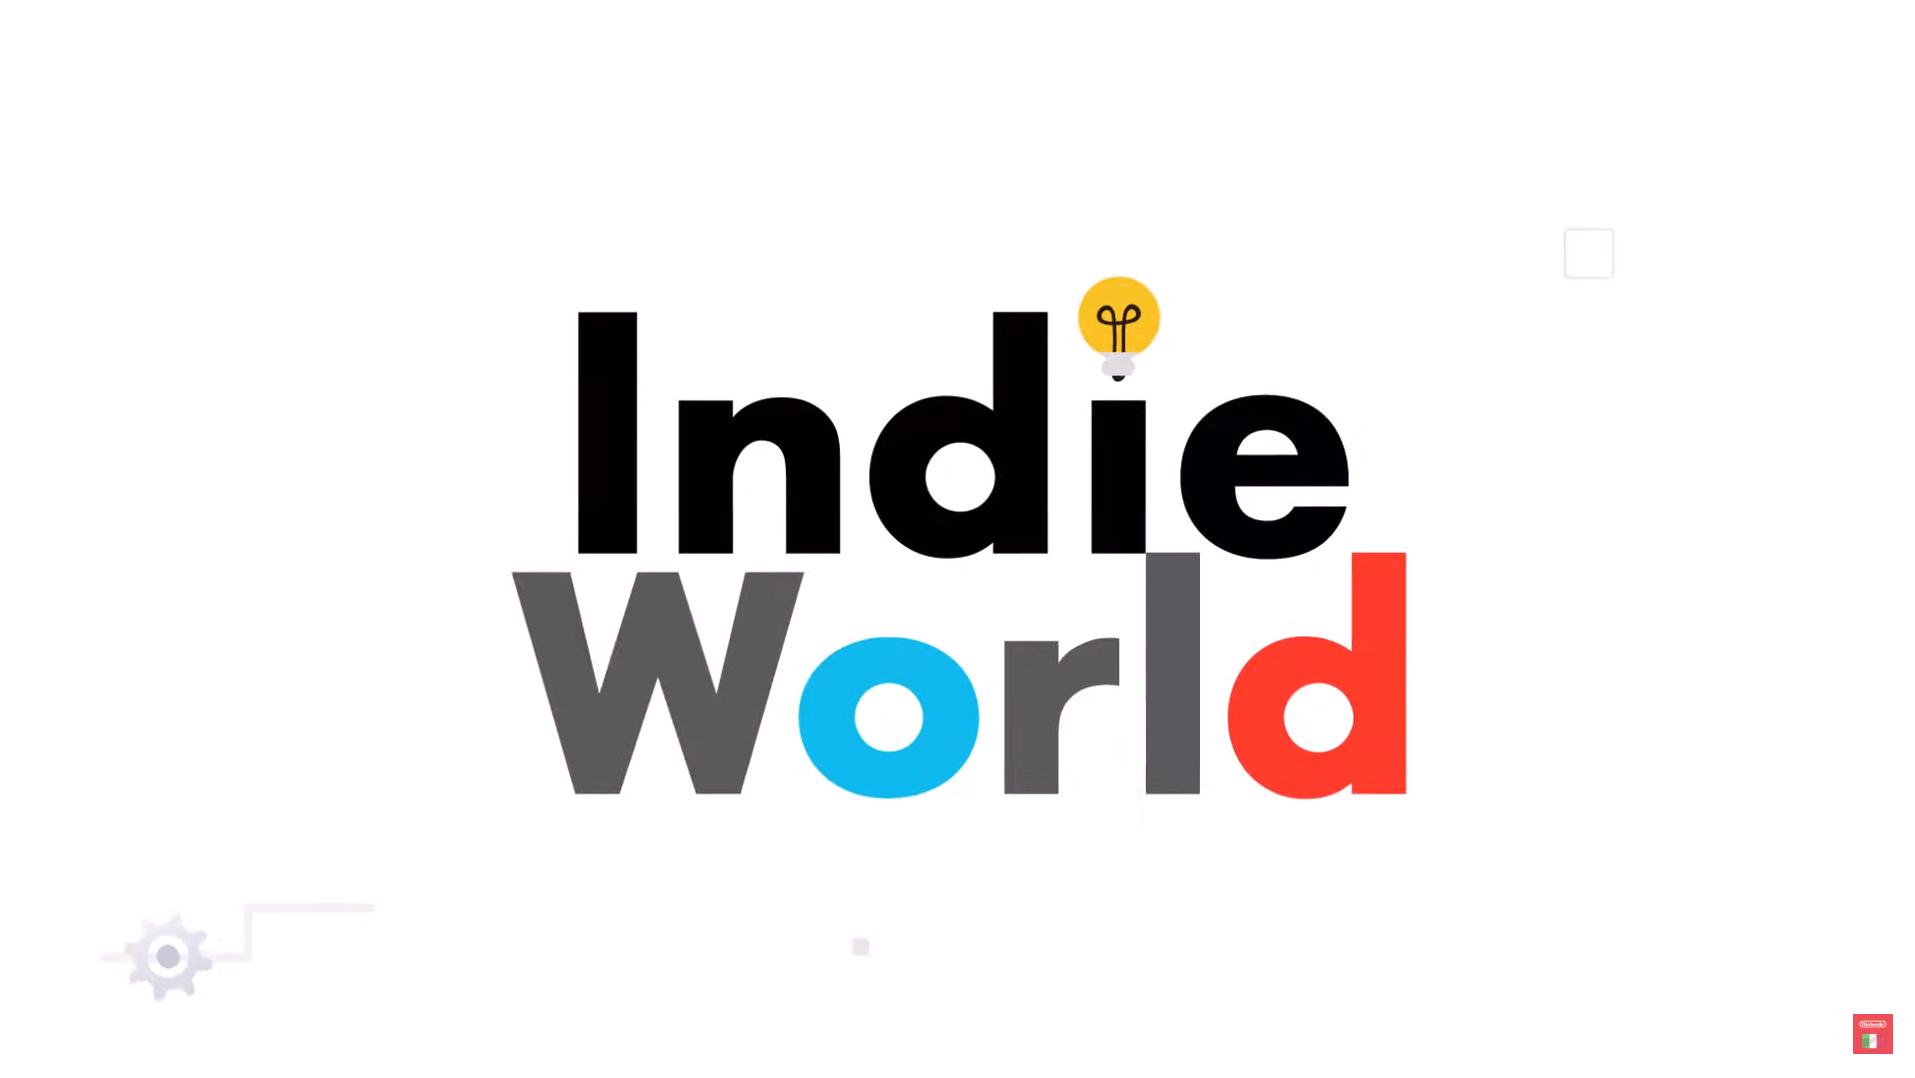 Nintendo Switch Indie World 18 agosto wallpaper